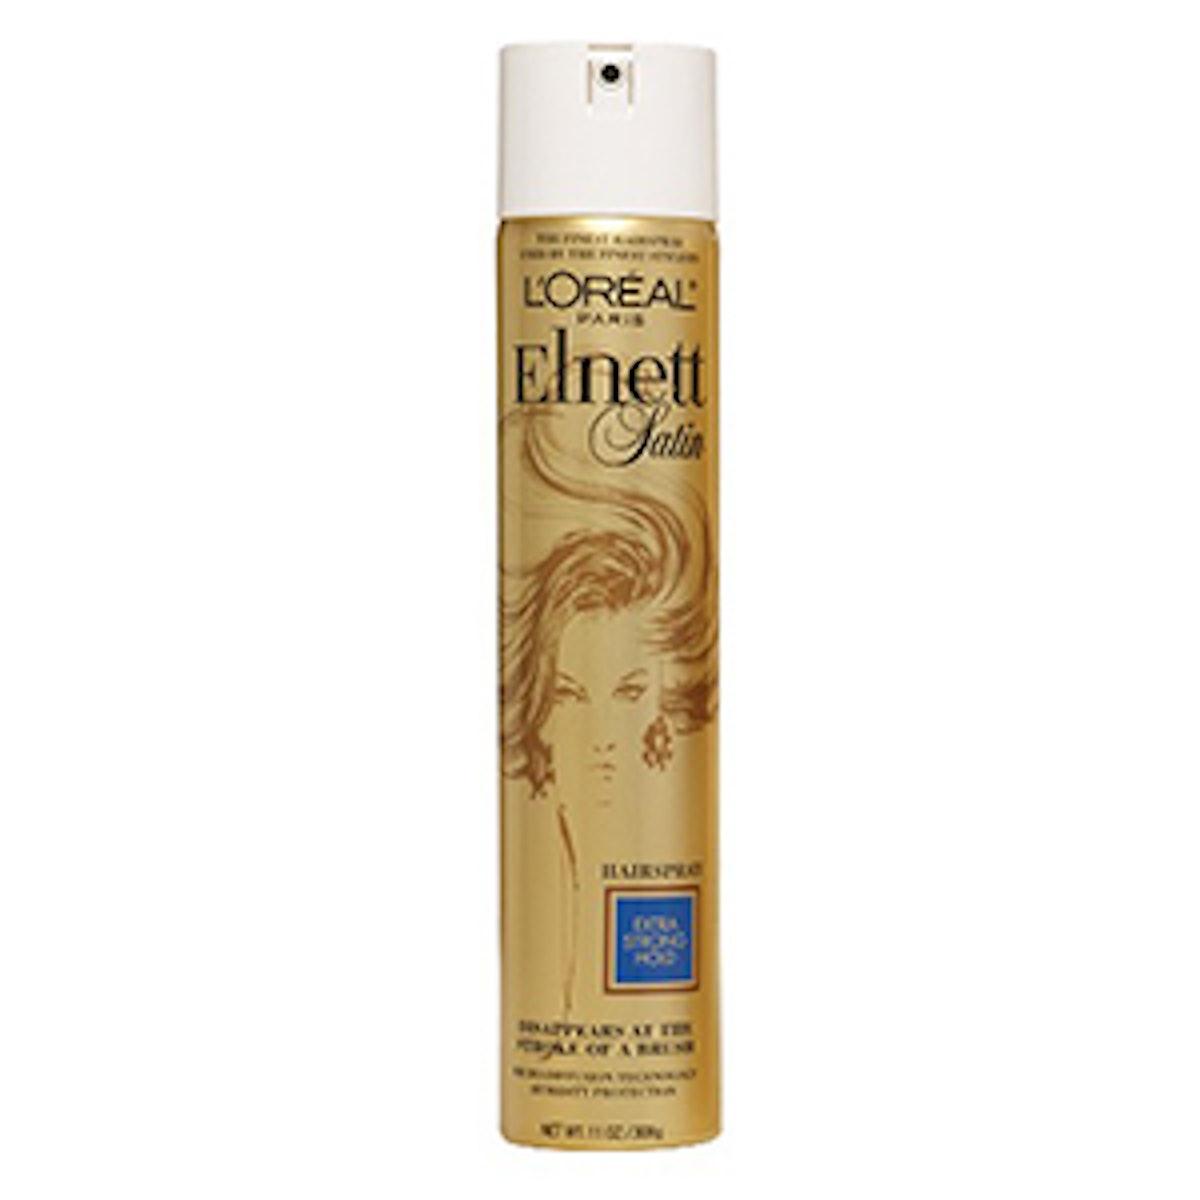 L'Oreal Paris Elnett Satin Hairspray Extra Strong Hold – 11.0oz